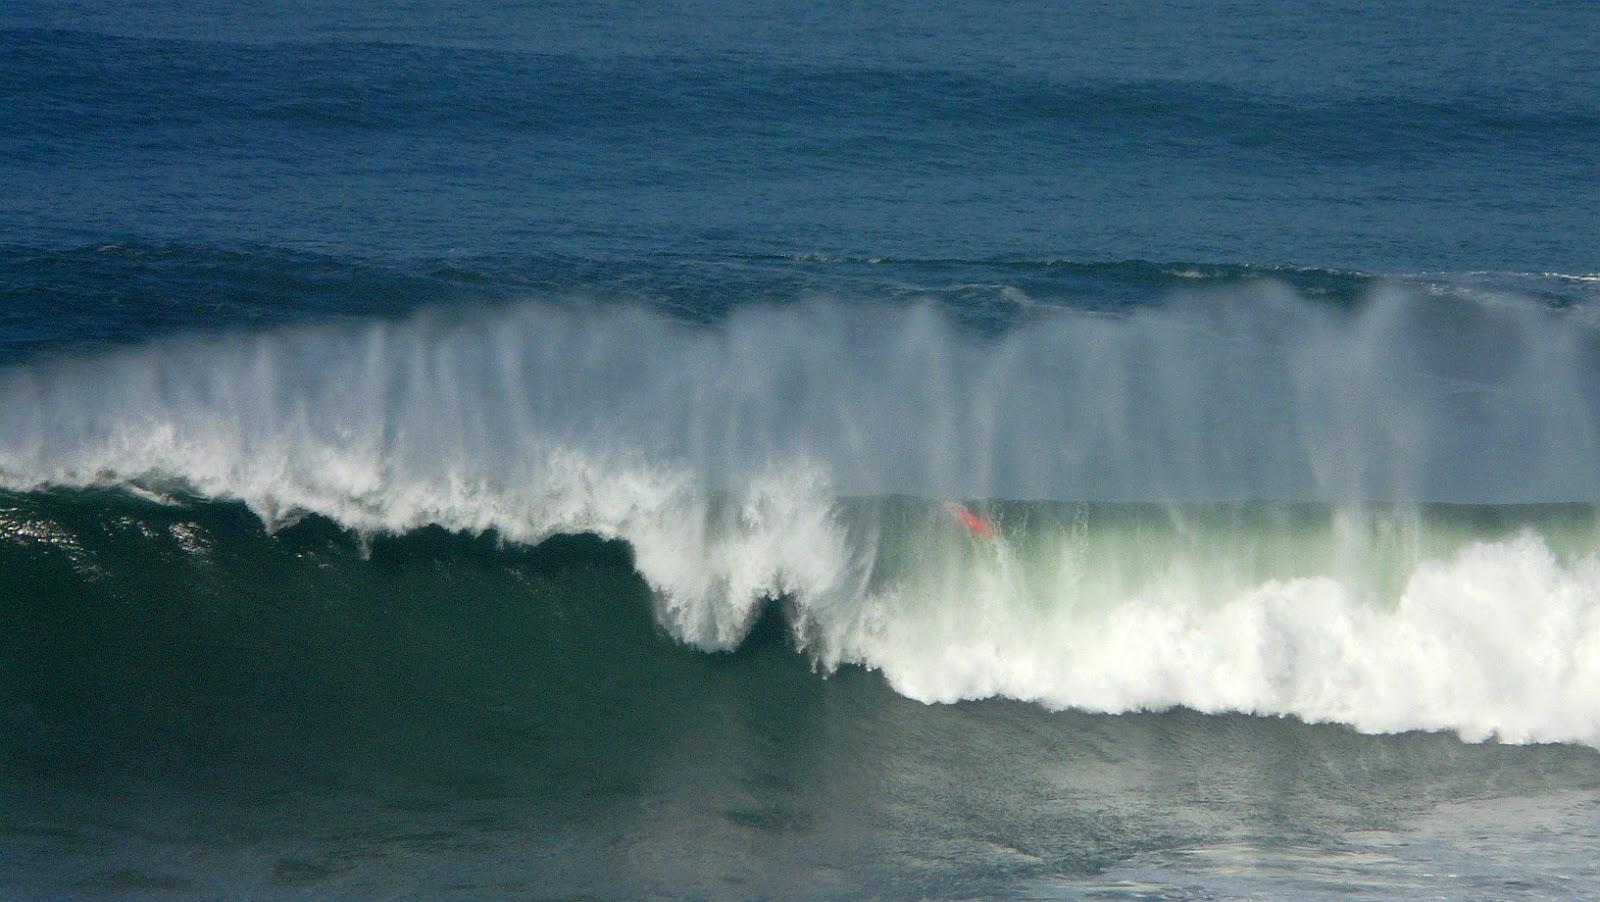 surf golf galea getxo bizkaia%2B%25286%2529